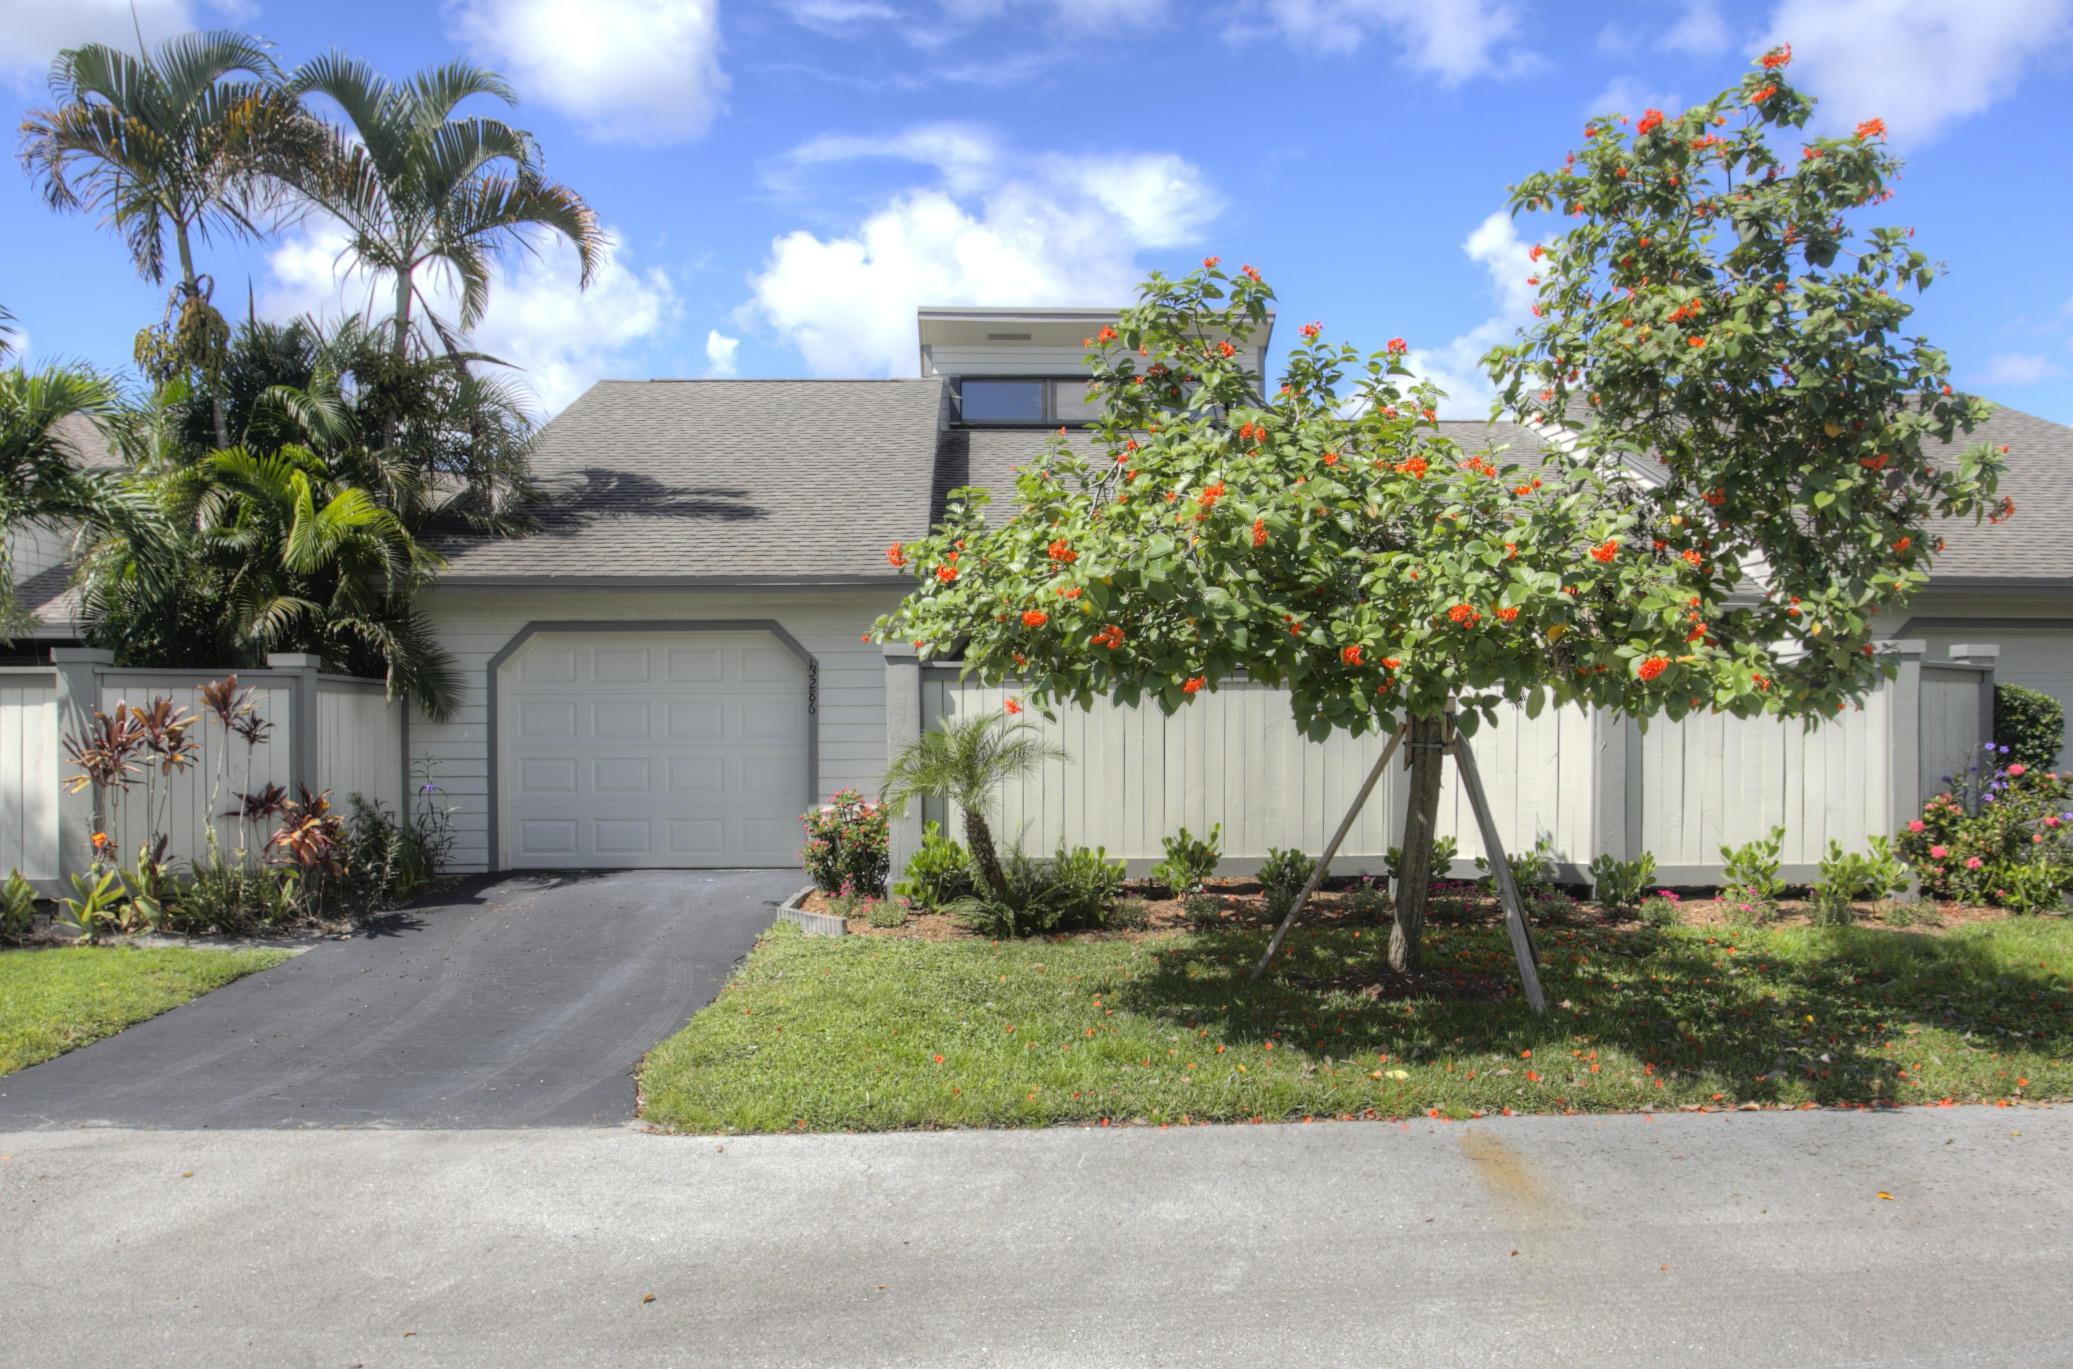 13286 BEDFORD MEWS COURT, WELLINGTON, FL 33414